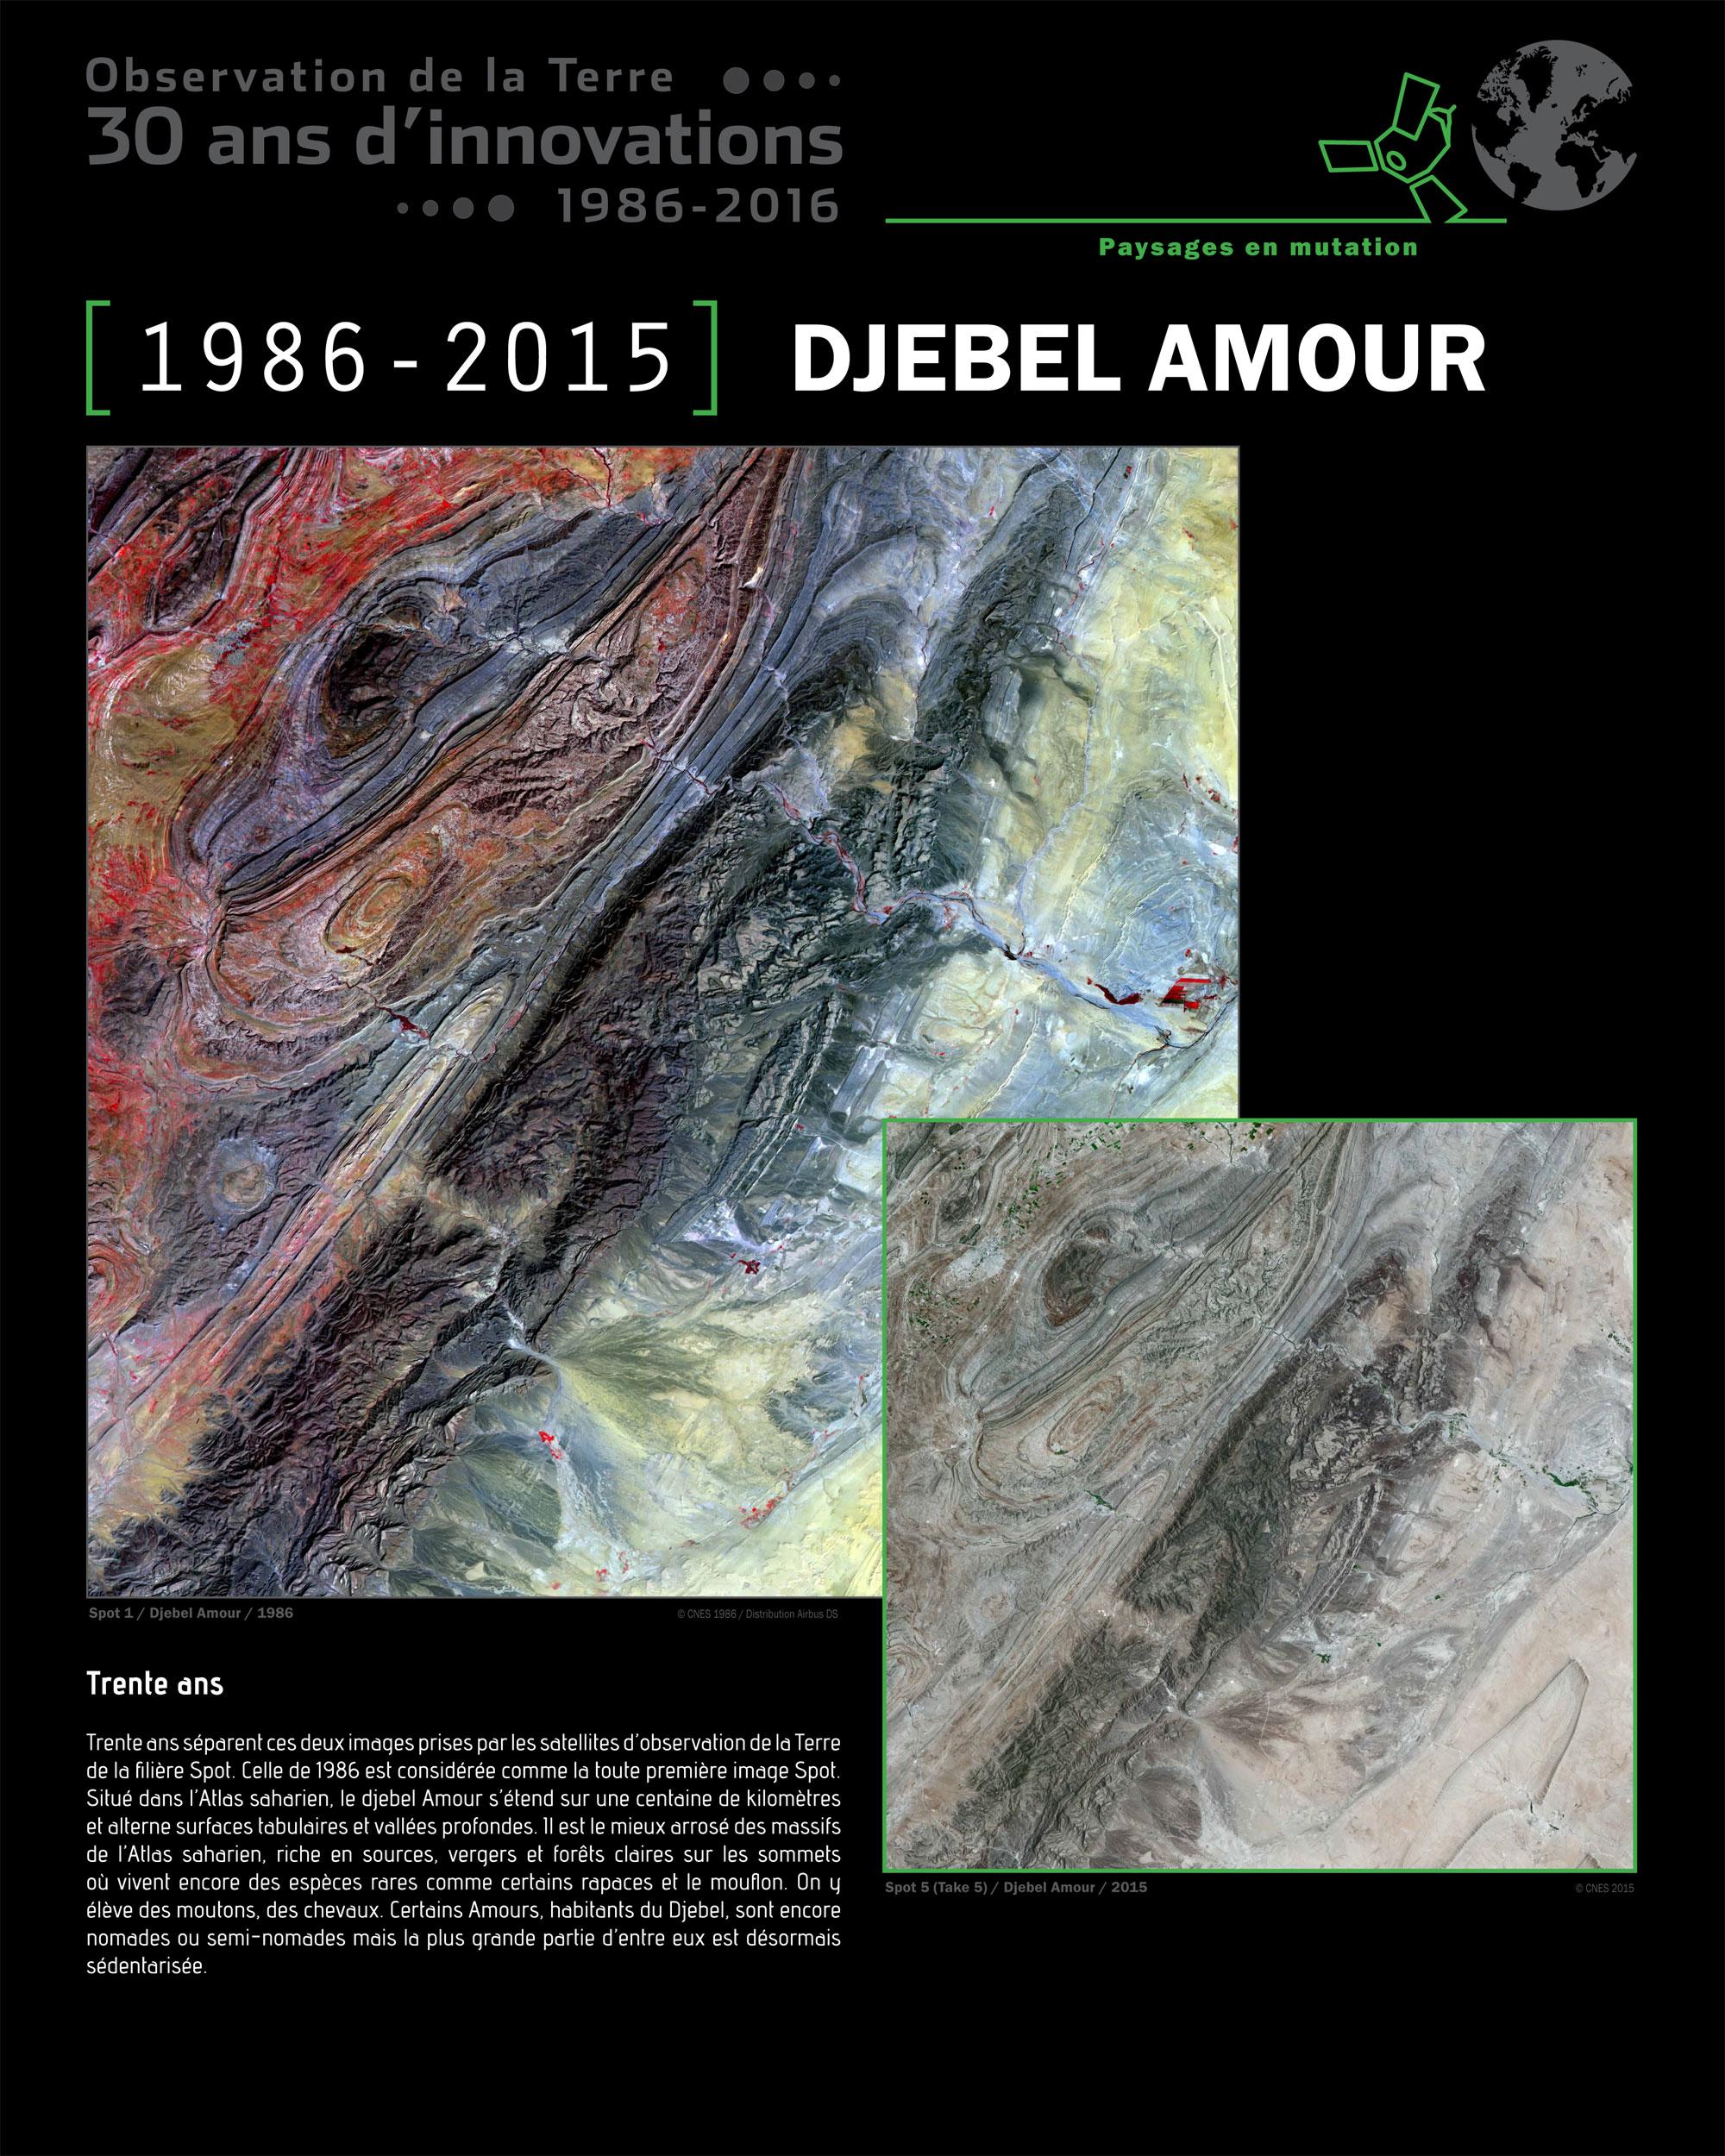 is_spot-30ans-djebel-amour-2.jpg